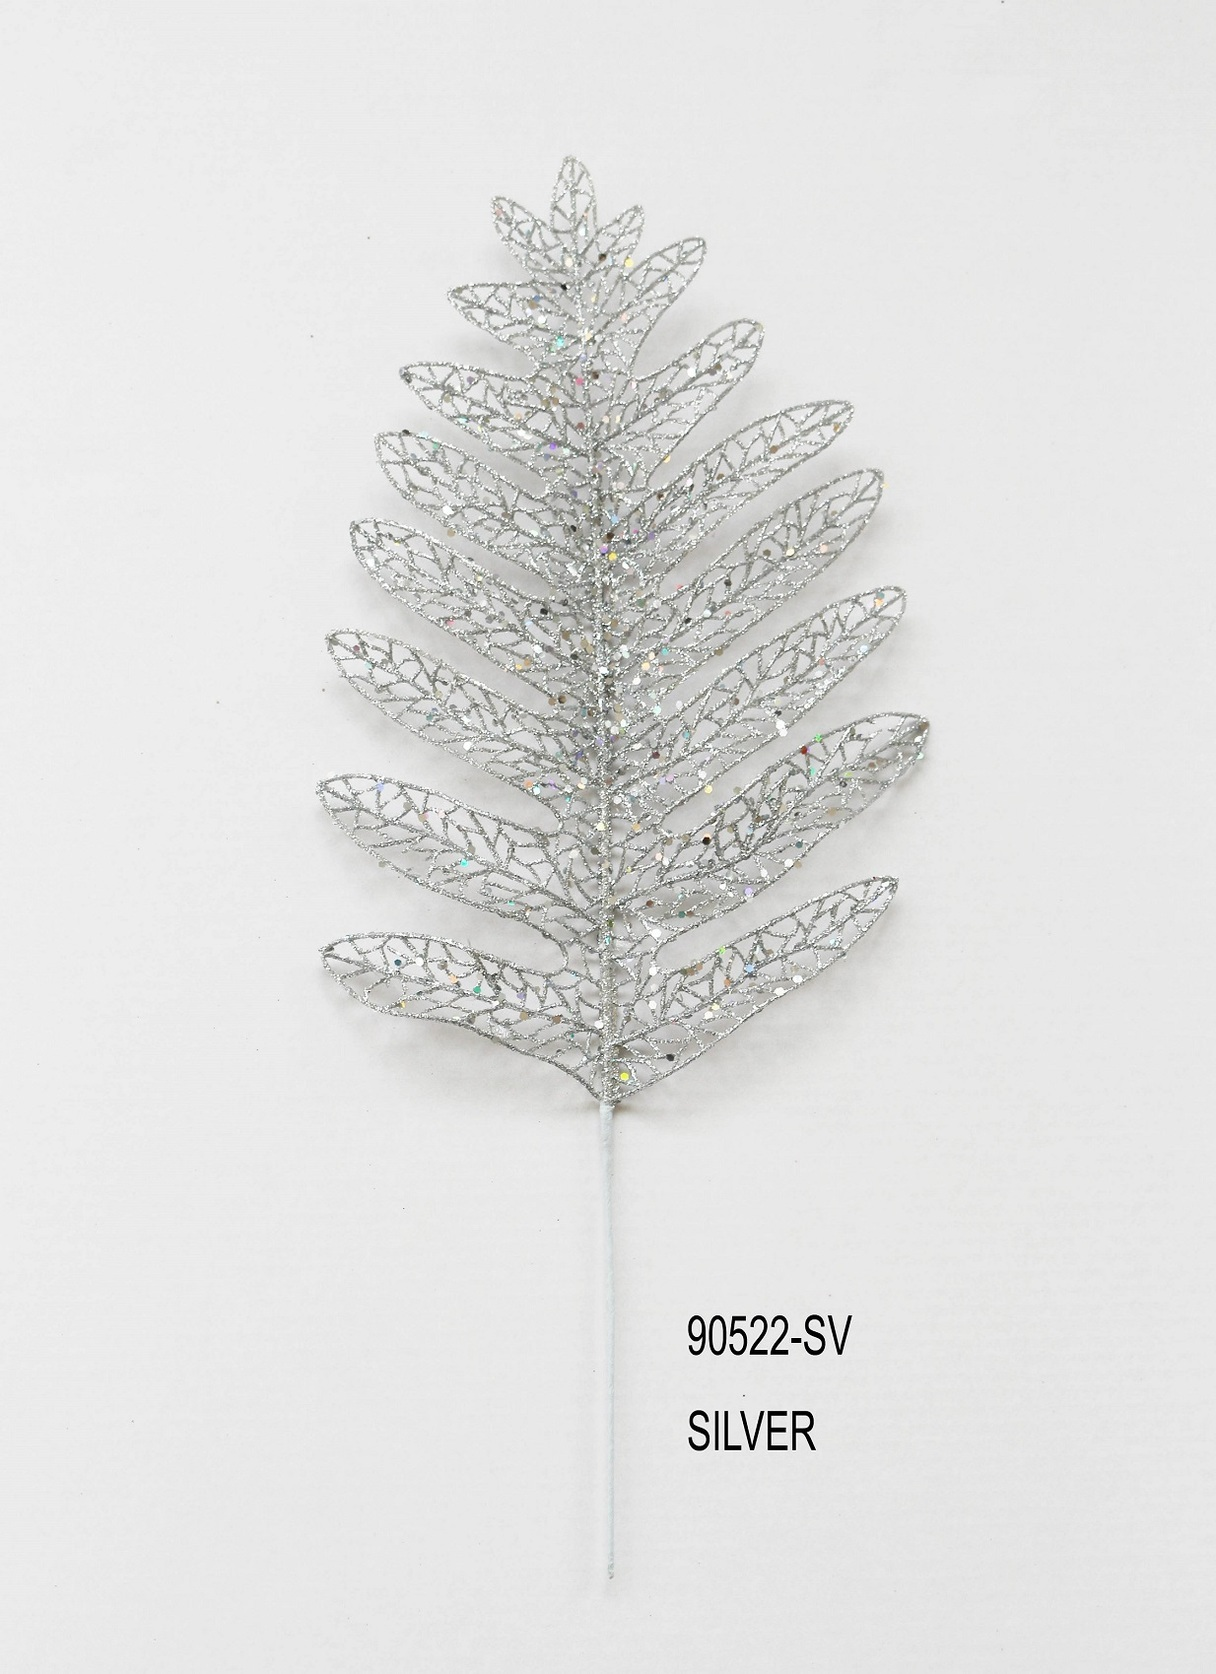 90522-SV